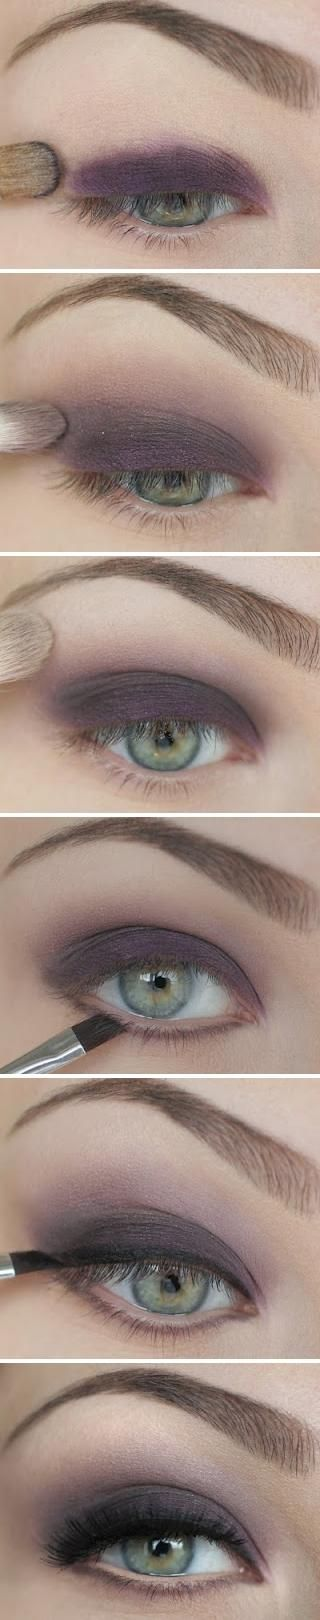 Smokey purple eyeshadow.